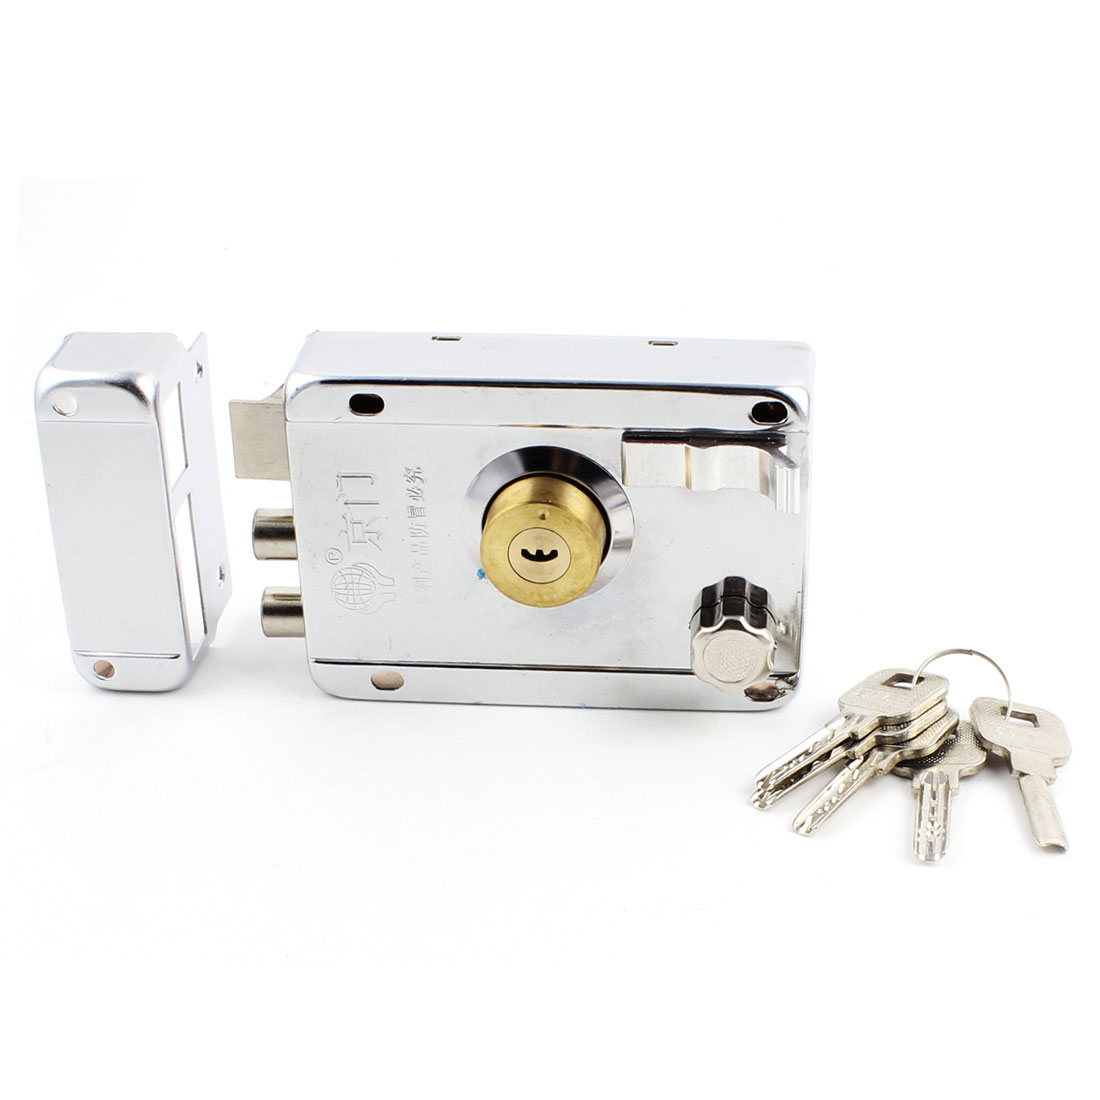 Home Dormitory Single Tongue Bolt Door Locking Latch Lock w 5 Keys